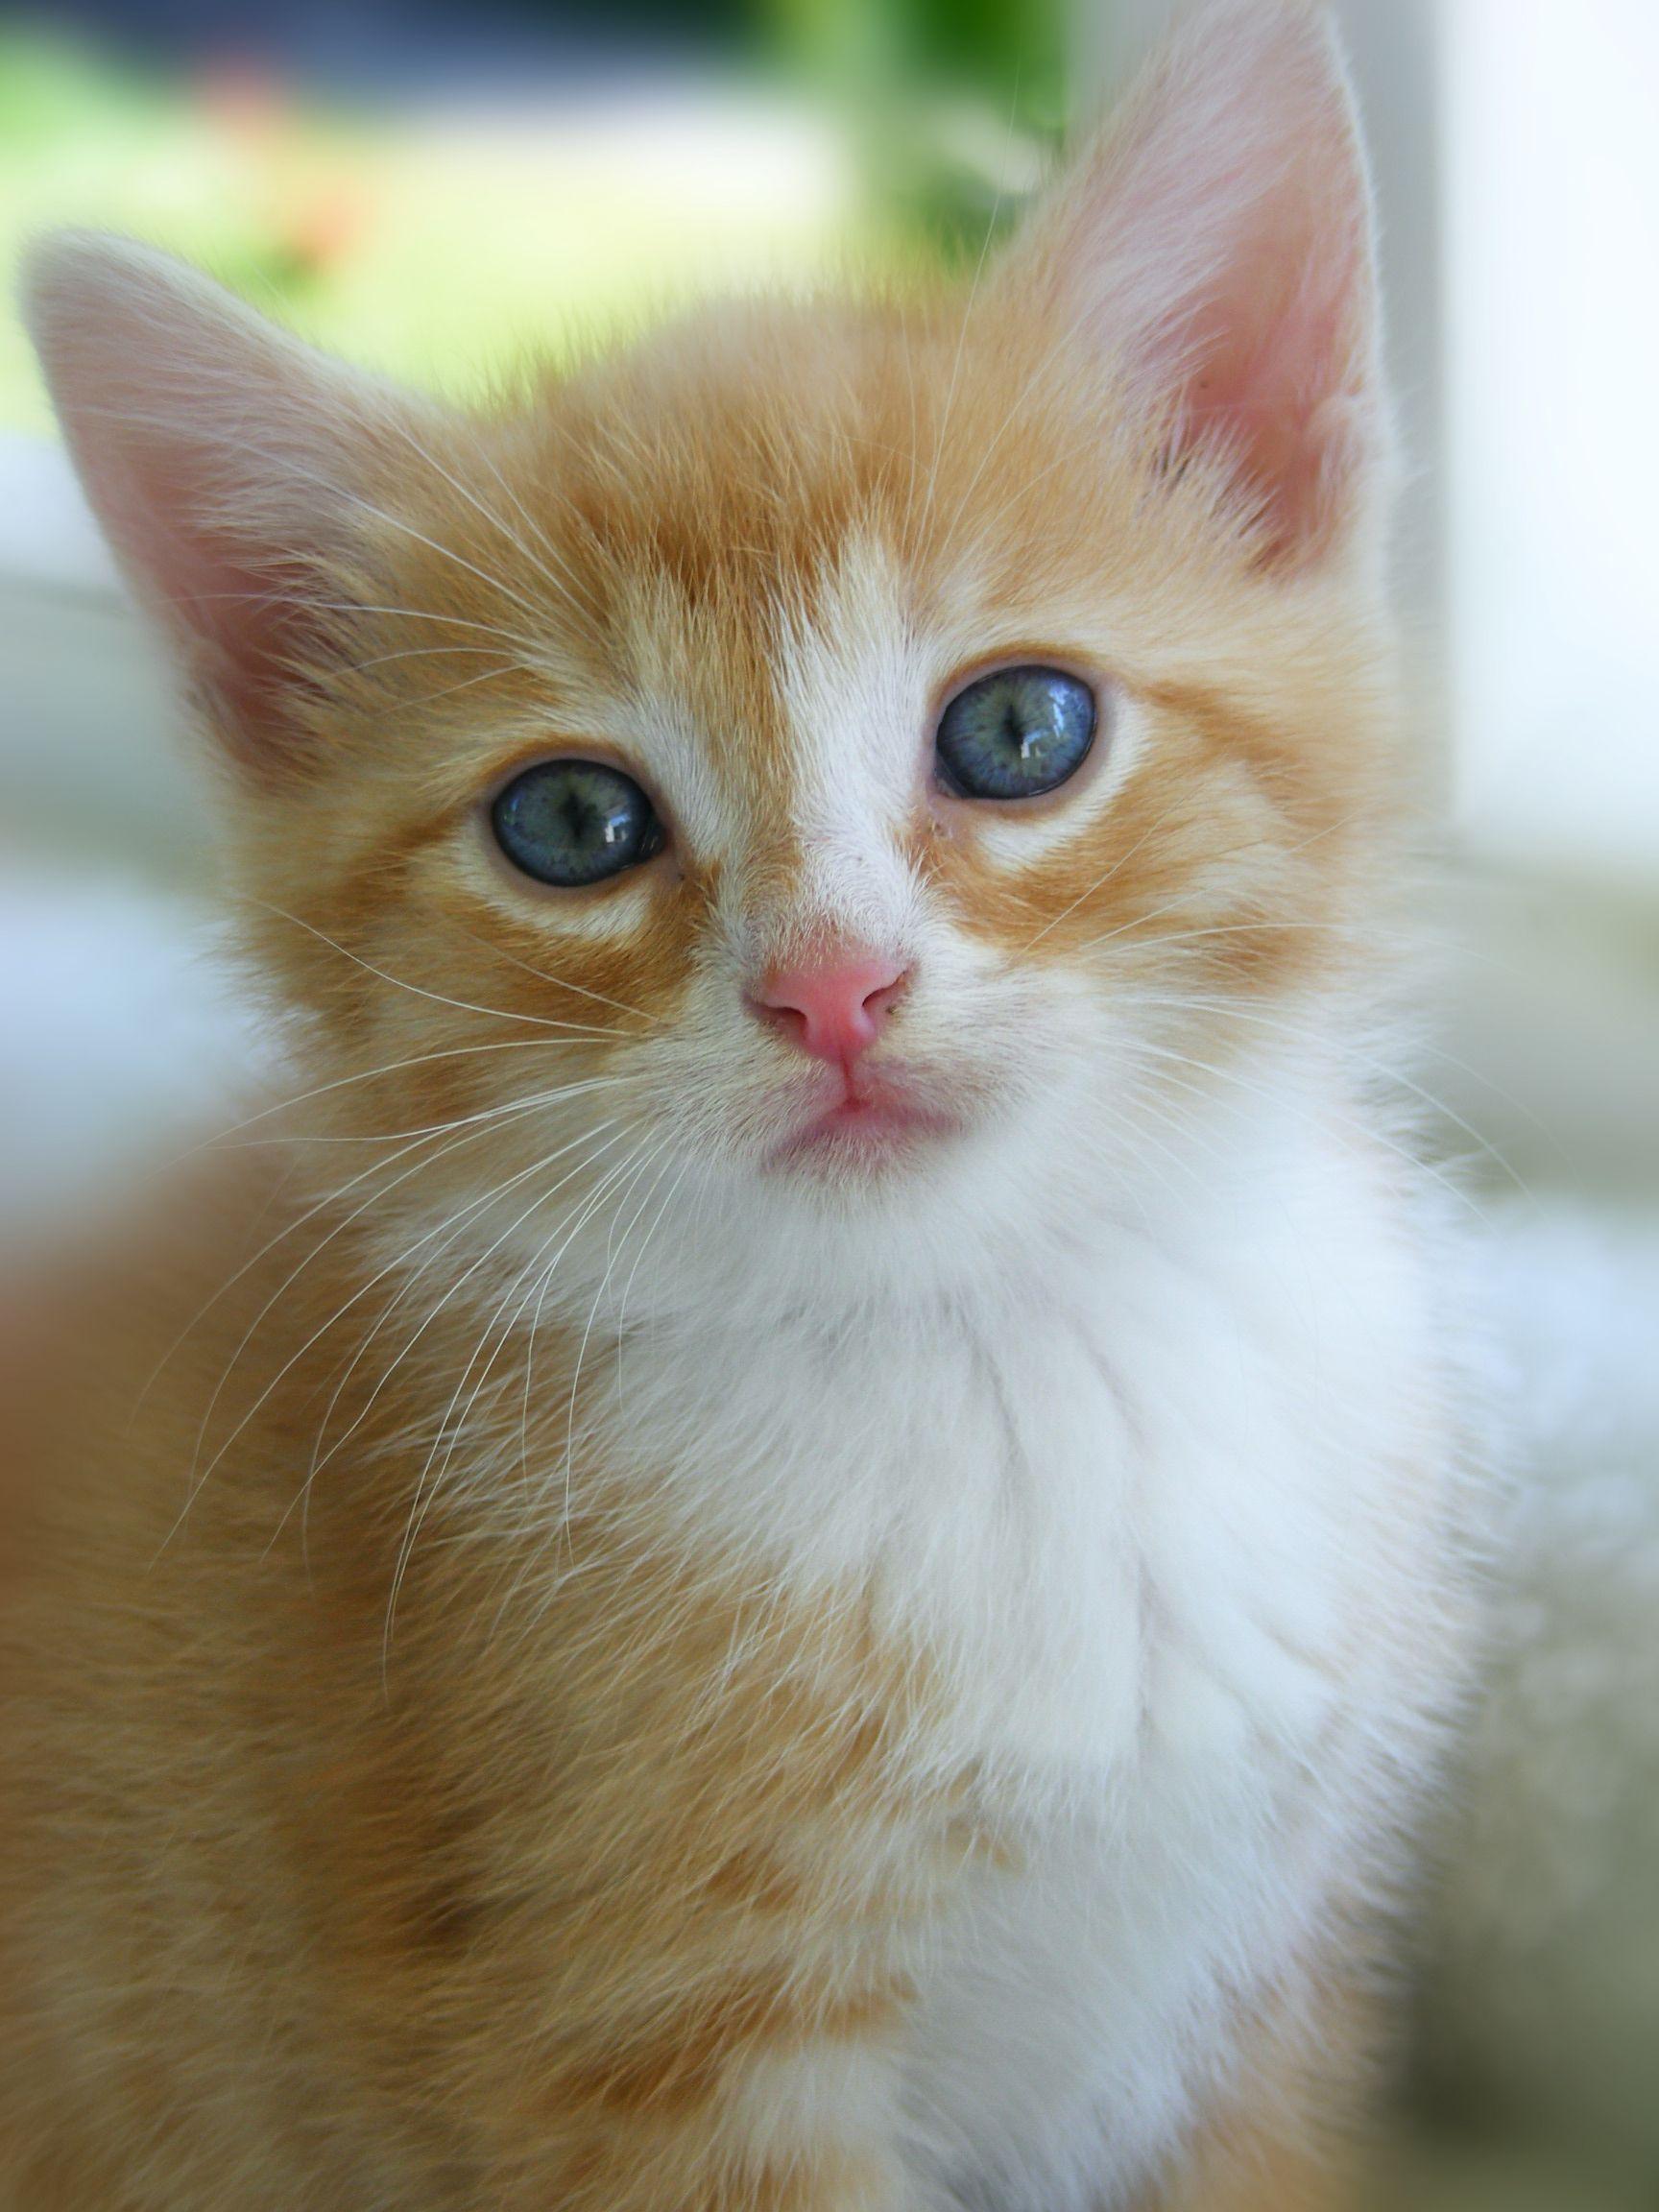 Image result for yellow kitten